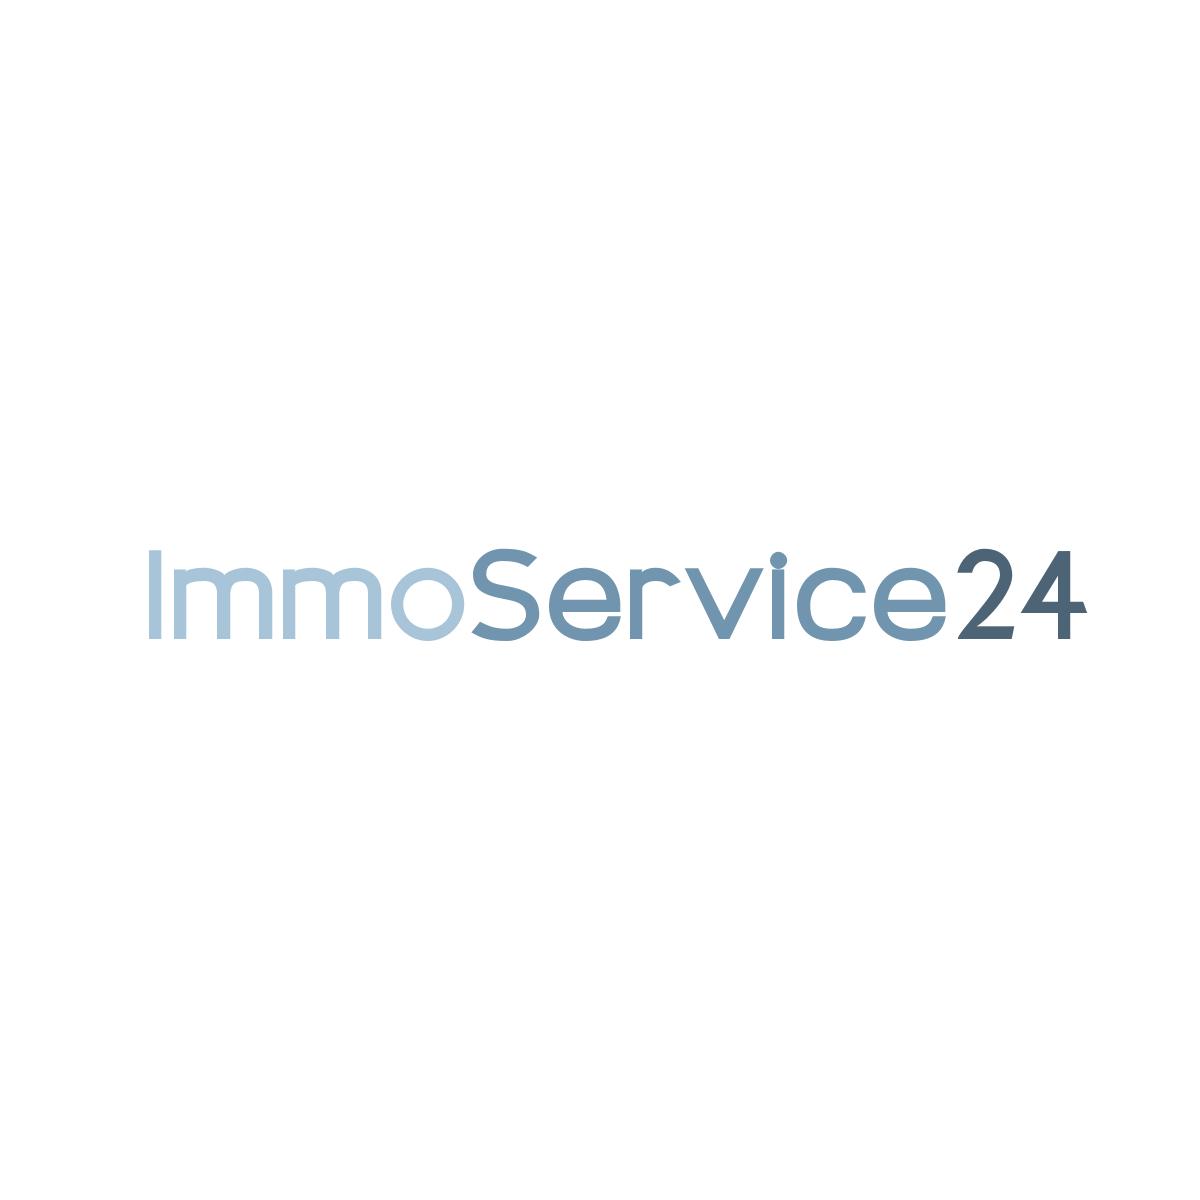 Immo Service 24